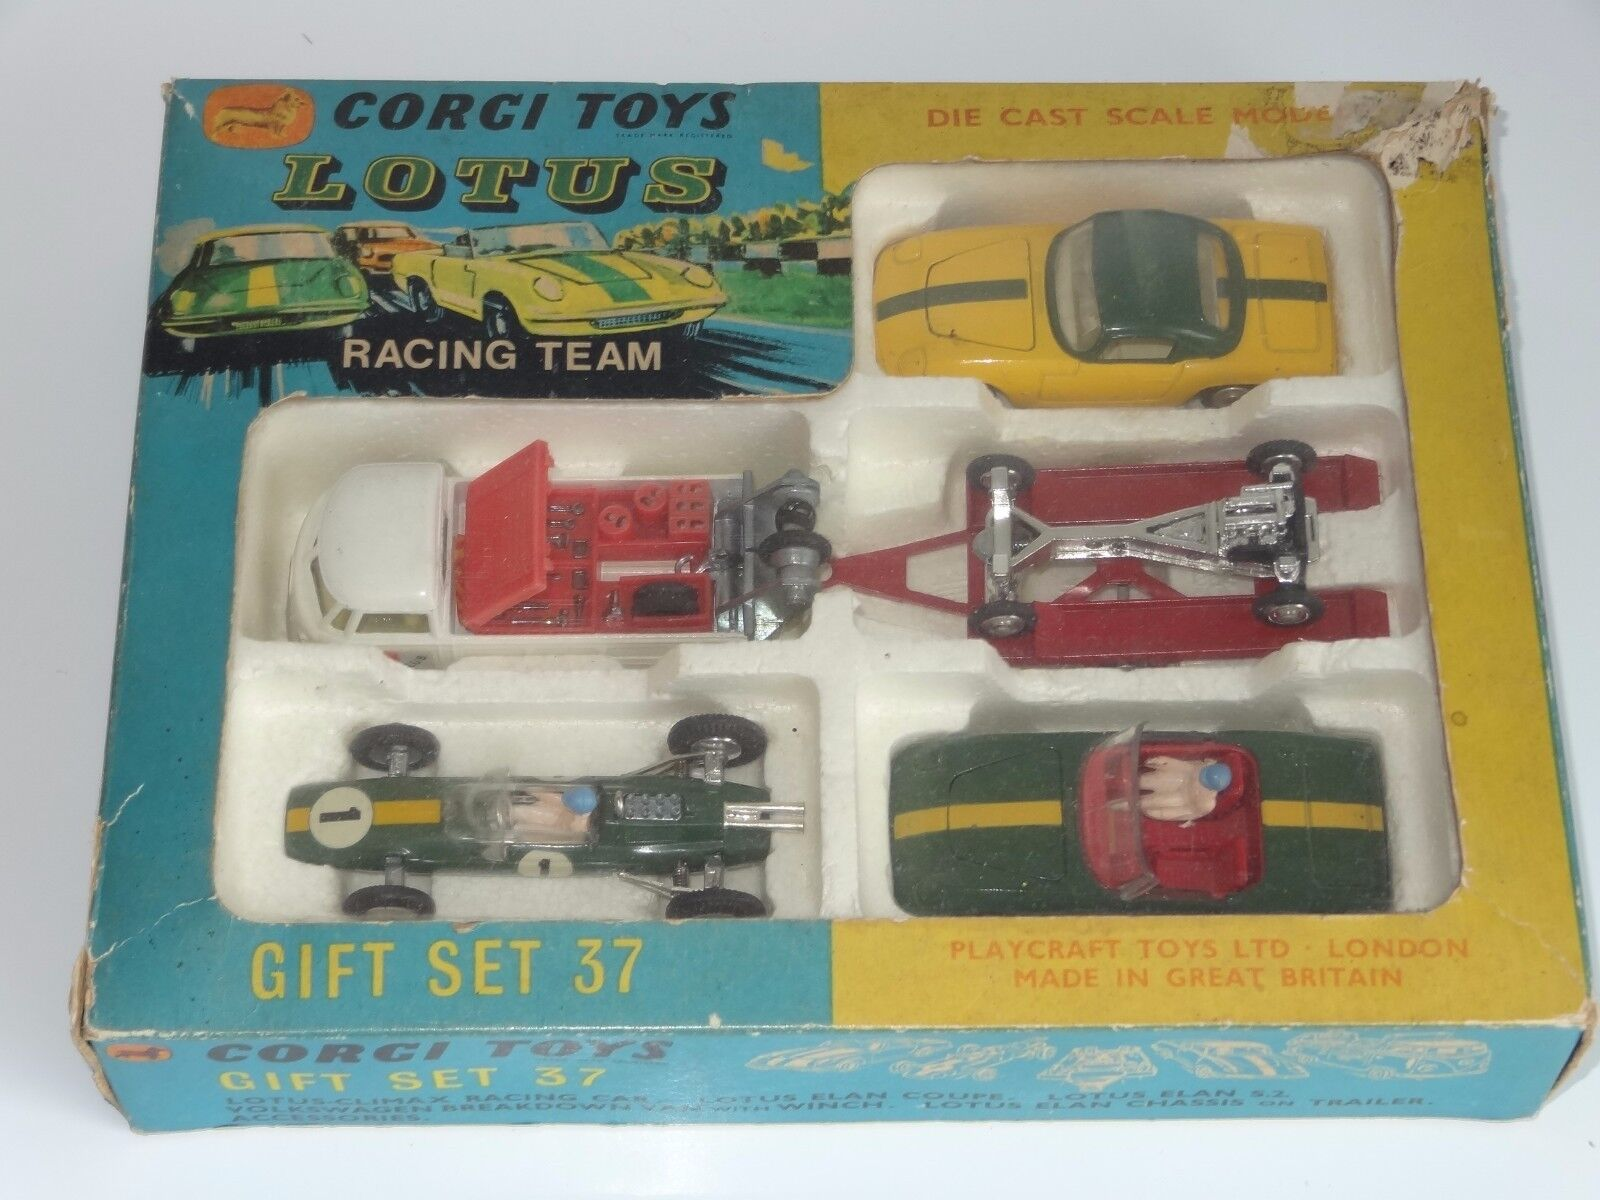 (V) Corgi Giftset Lotus Racing Team-GS 37